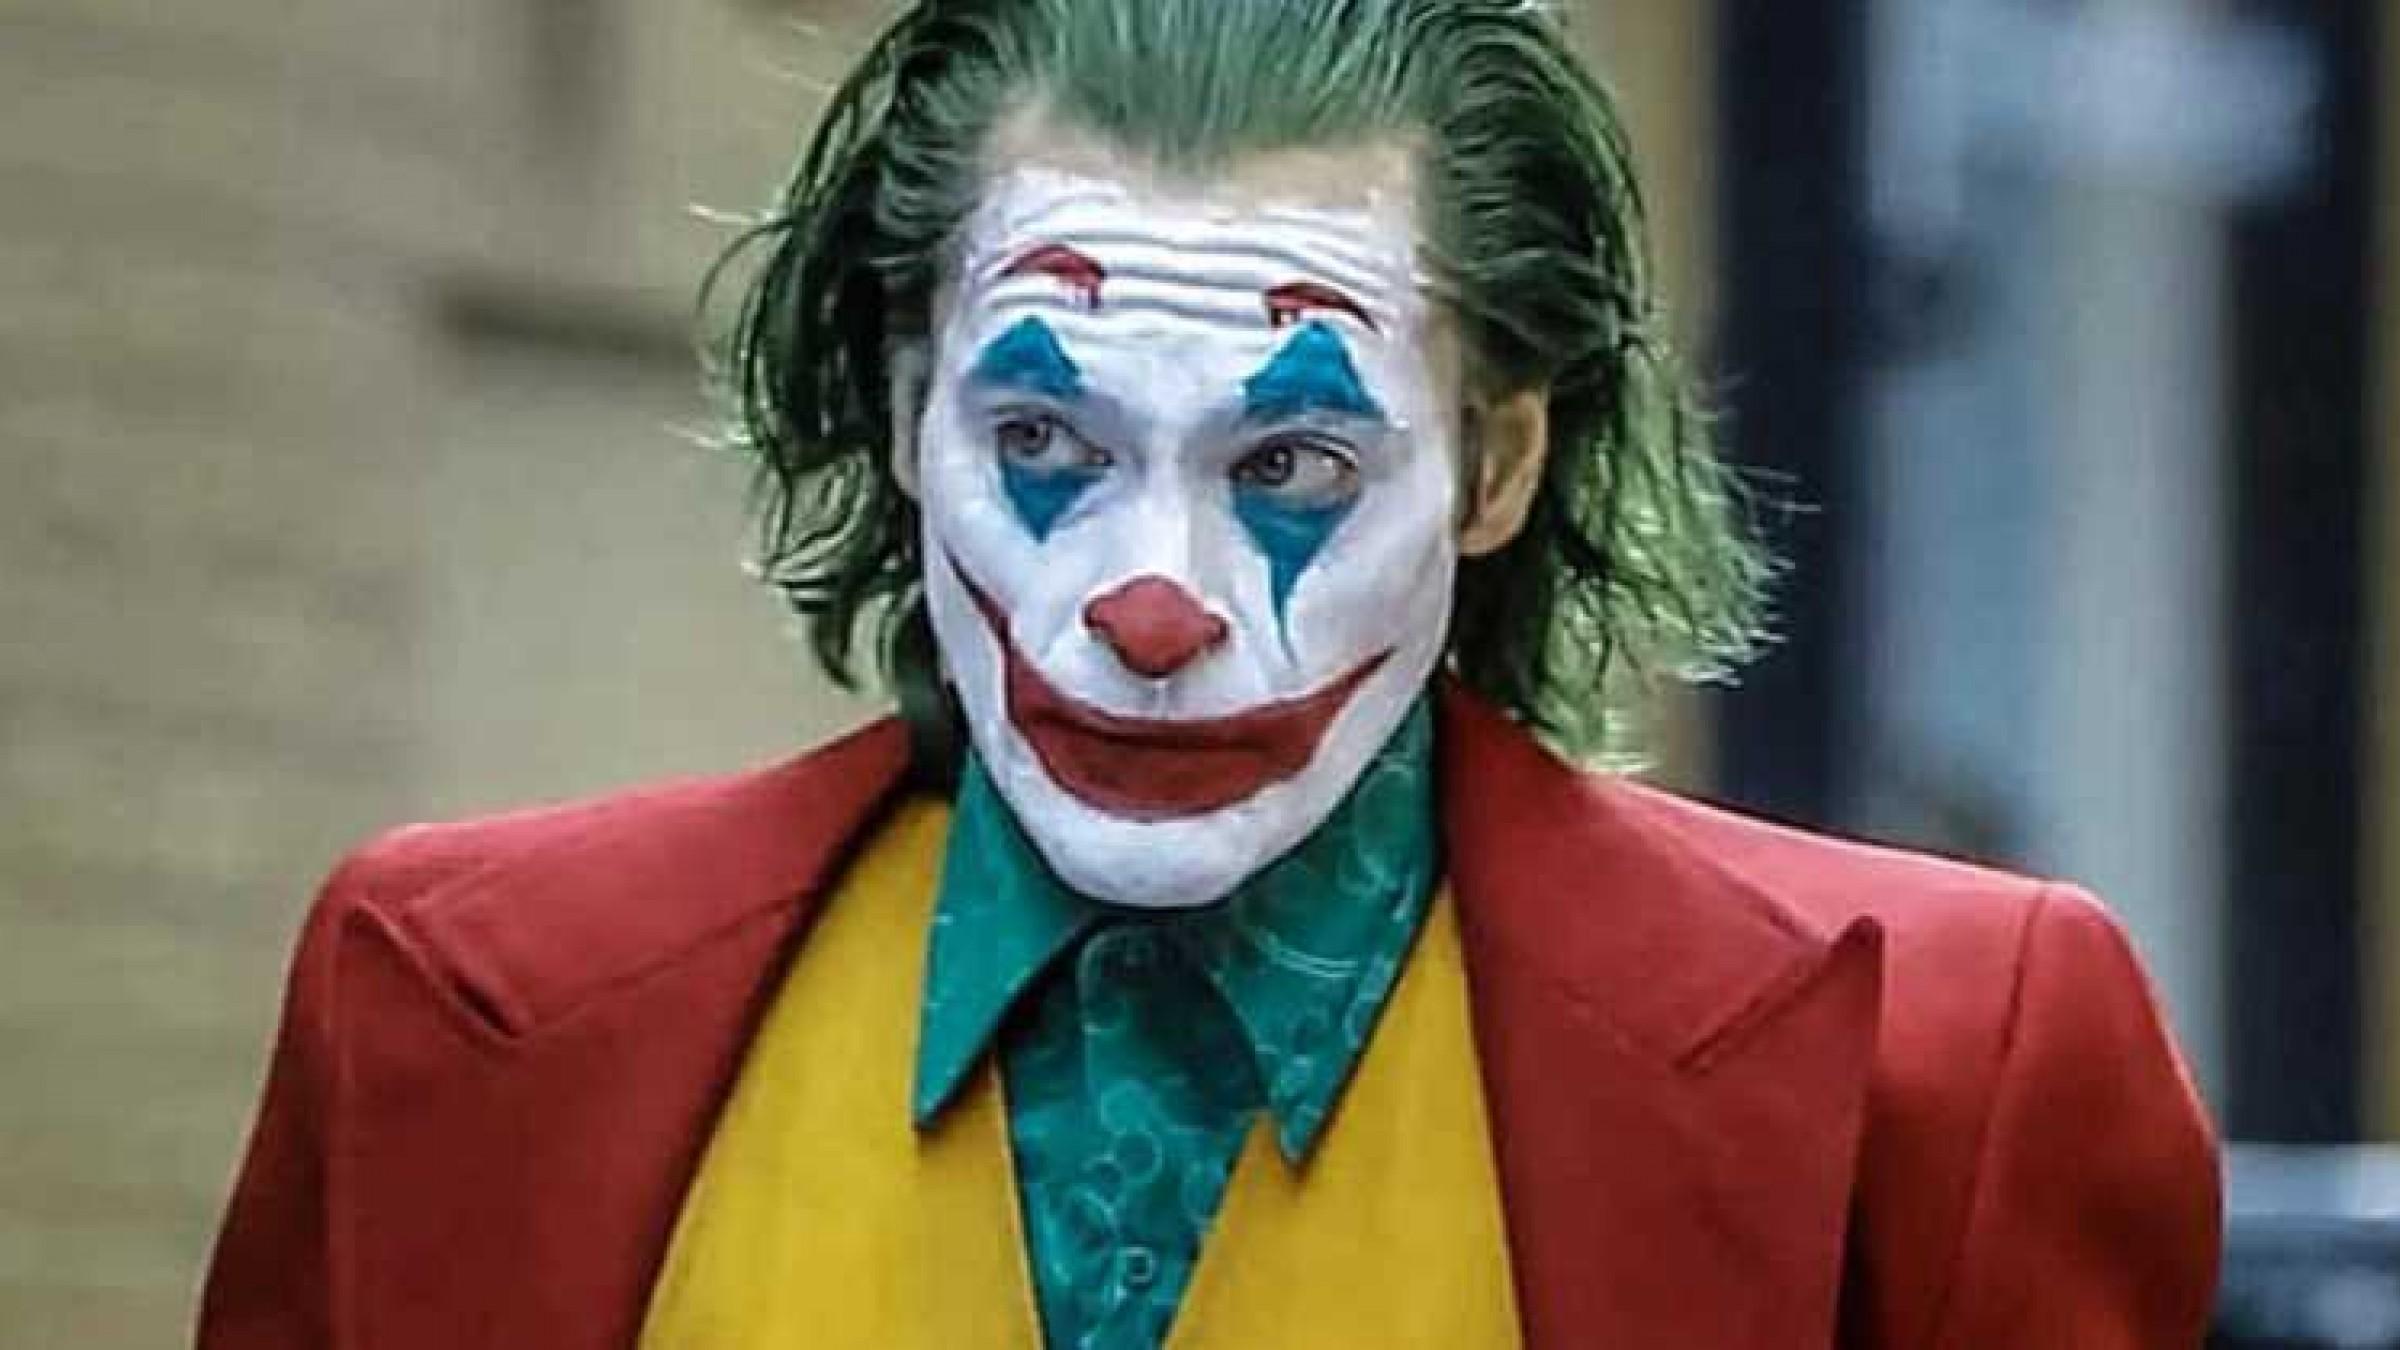 David Fincher: O Joker ήταν μία προσβολή για τους ανθρώπους με ψυχικές ασθένειες